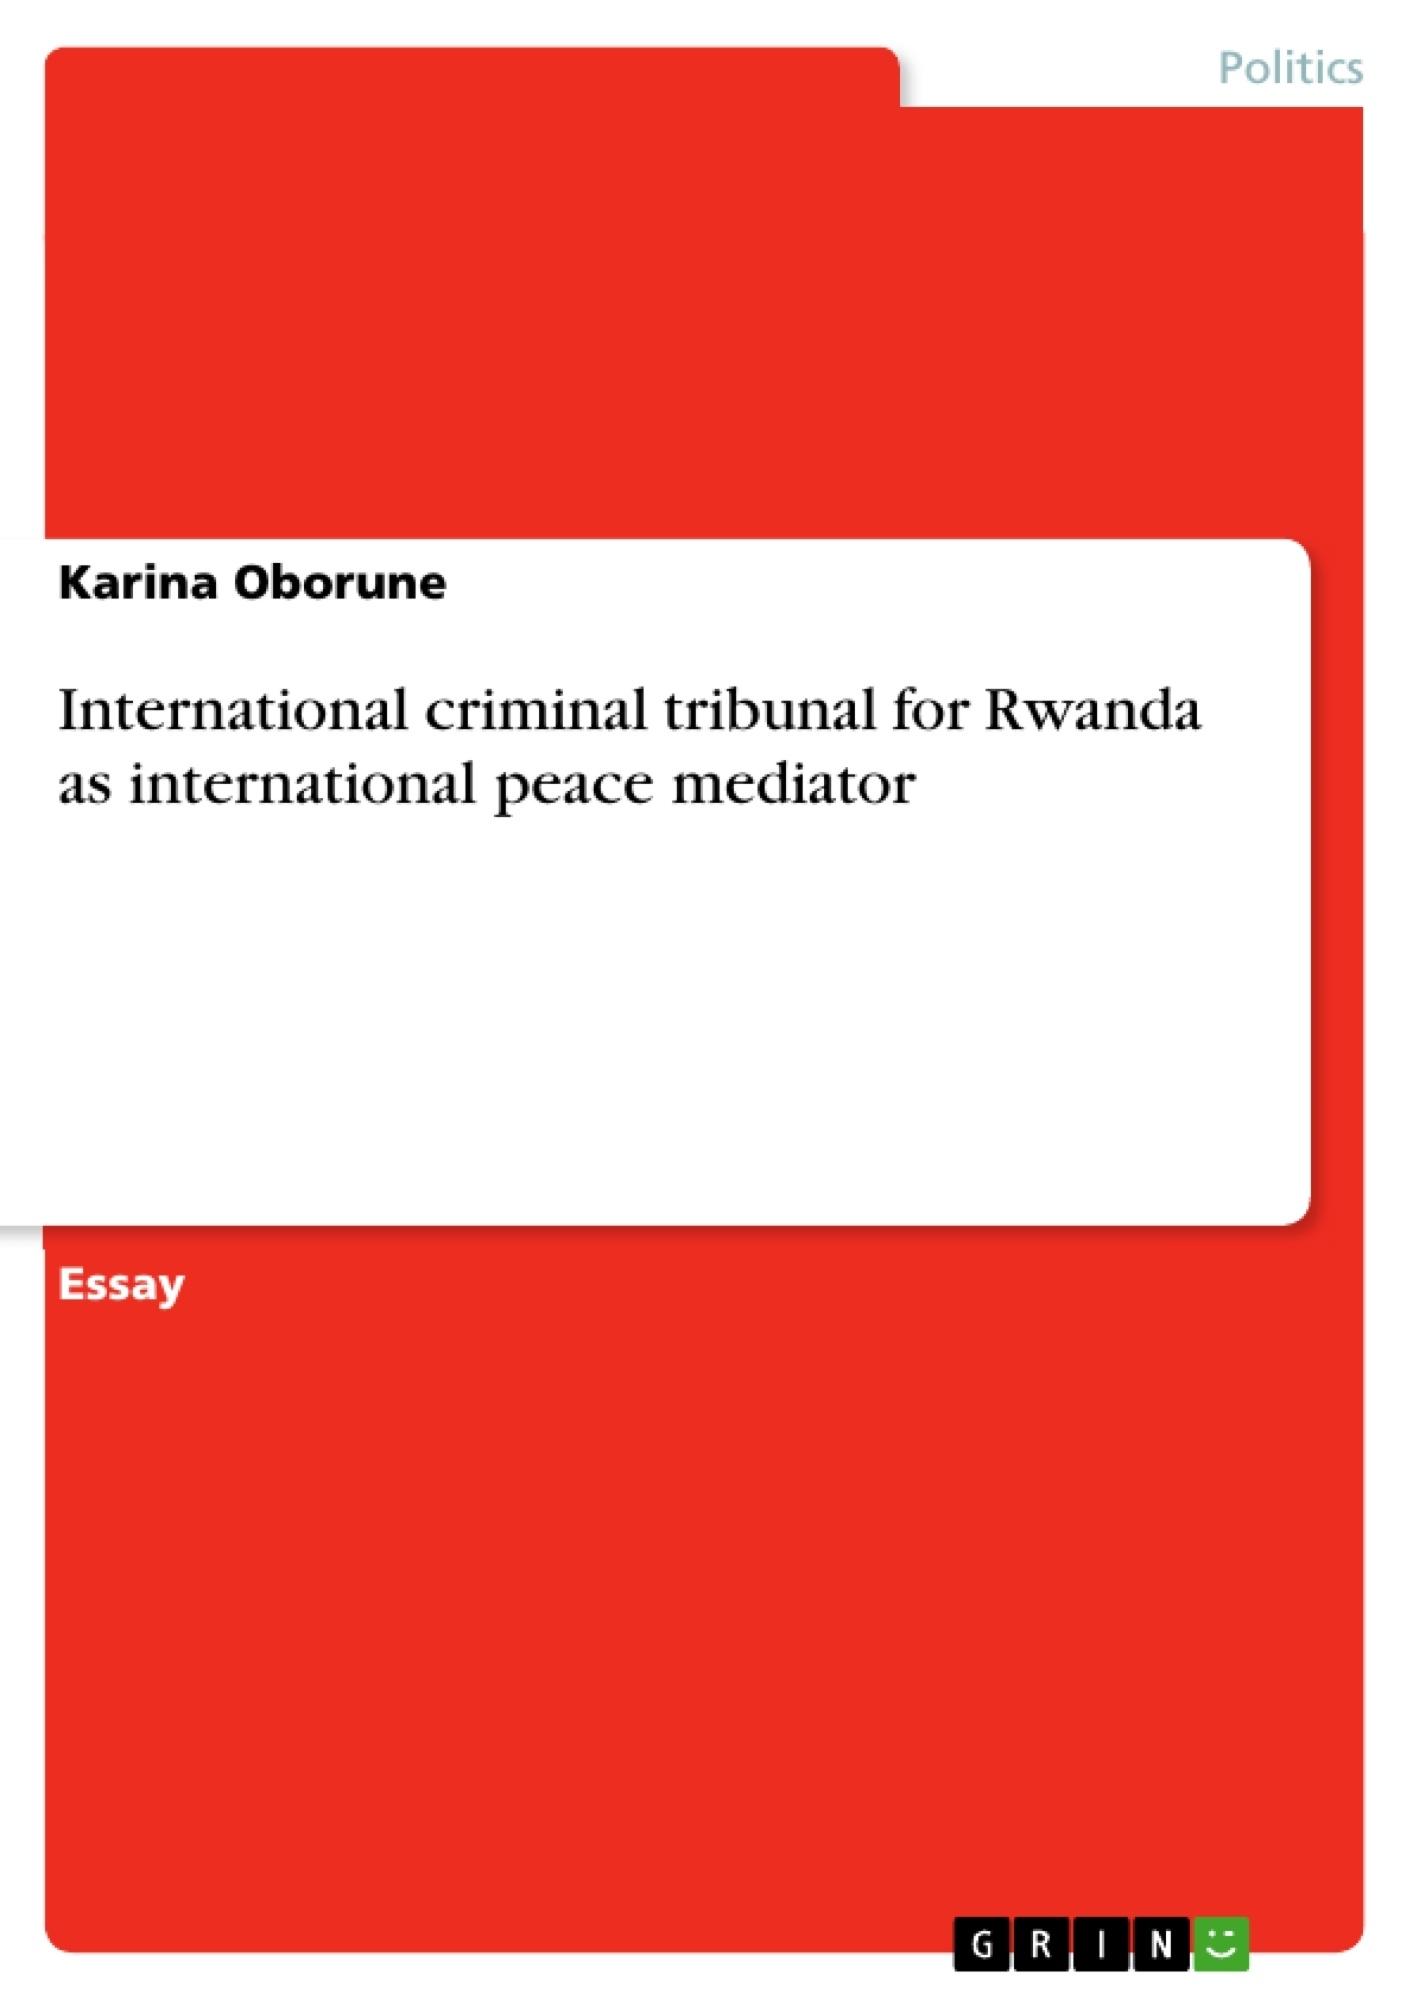 Title: International criminal tribunal for Rwanda as international peace mediator